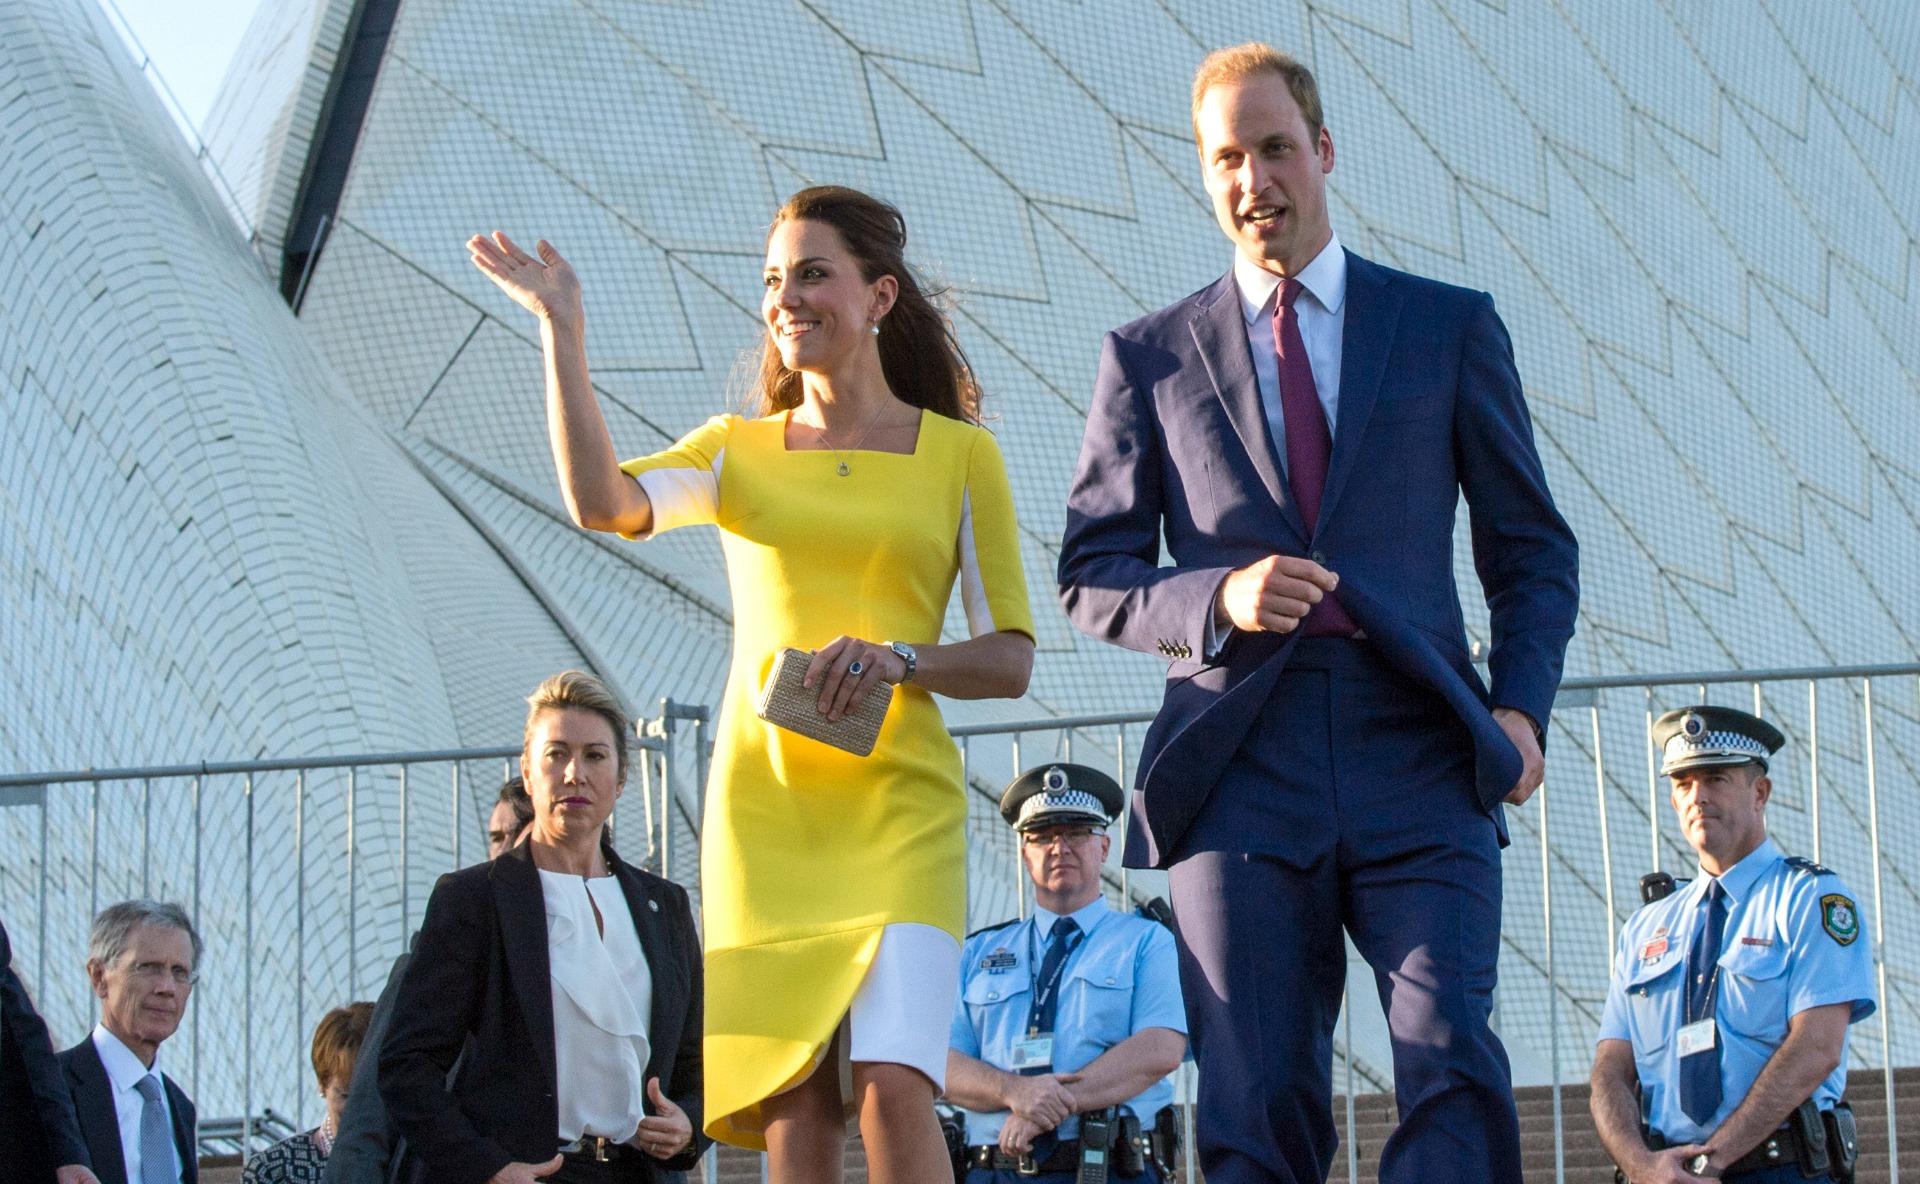 The royal family arrives in Australia